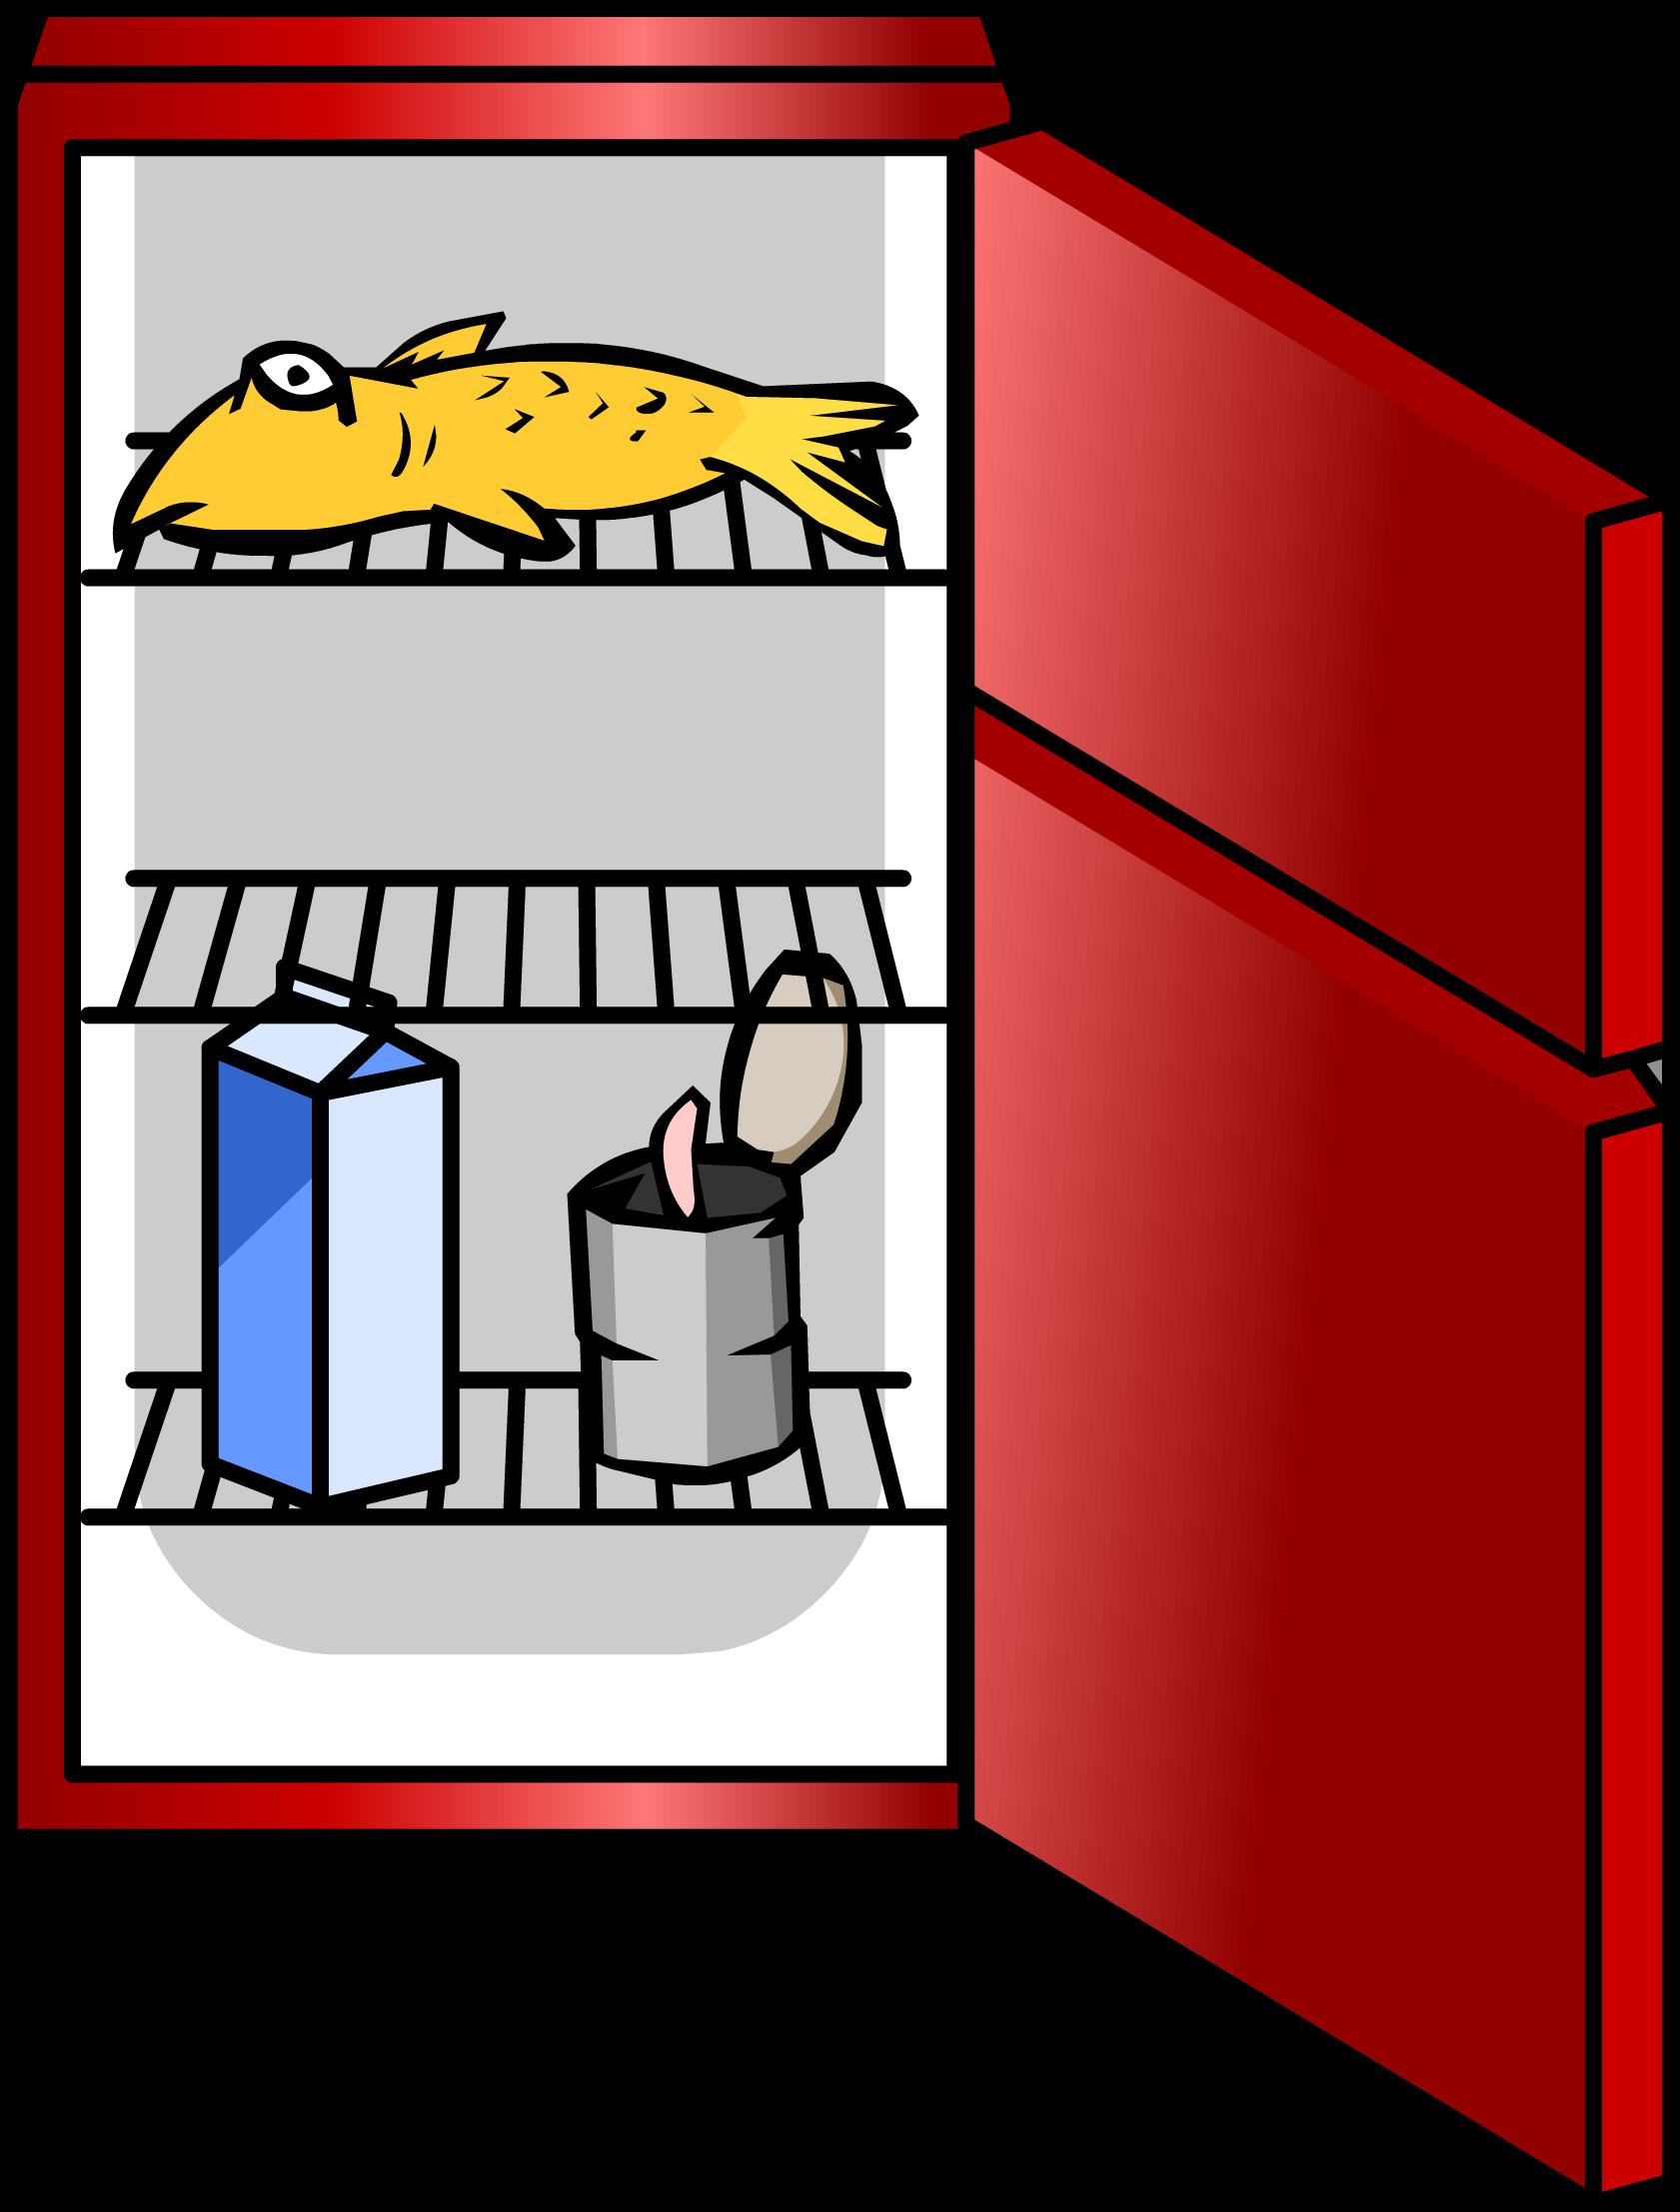 Fridge clipart game. Image shiny red sprite